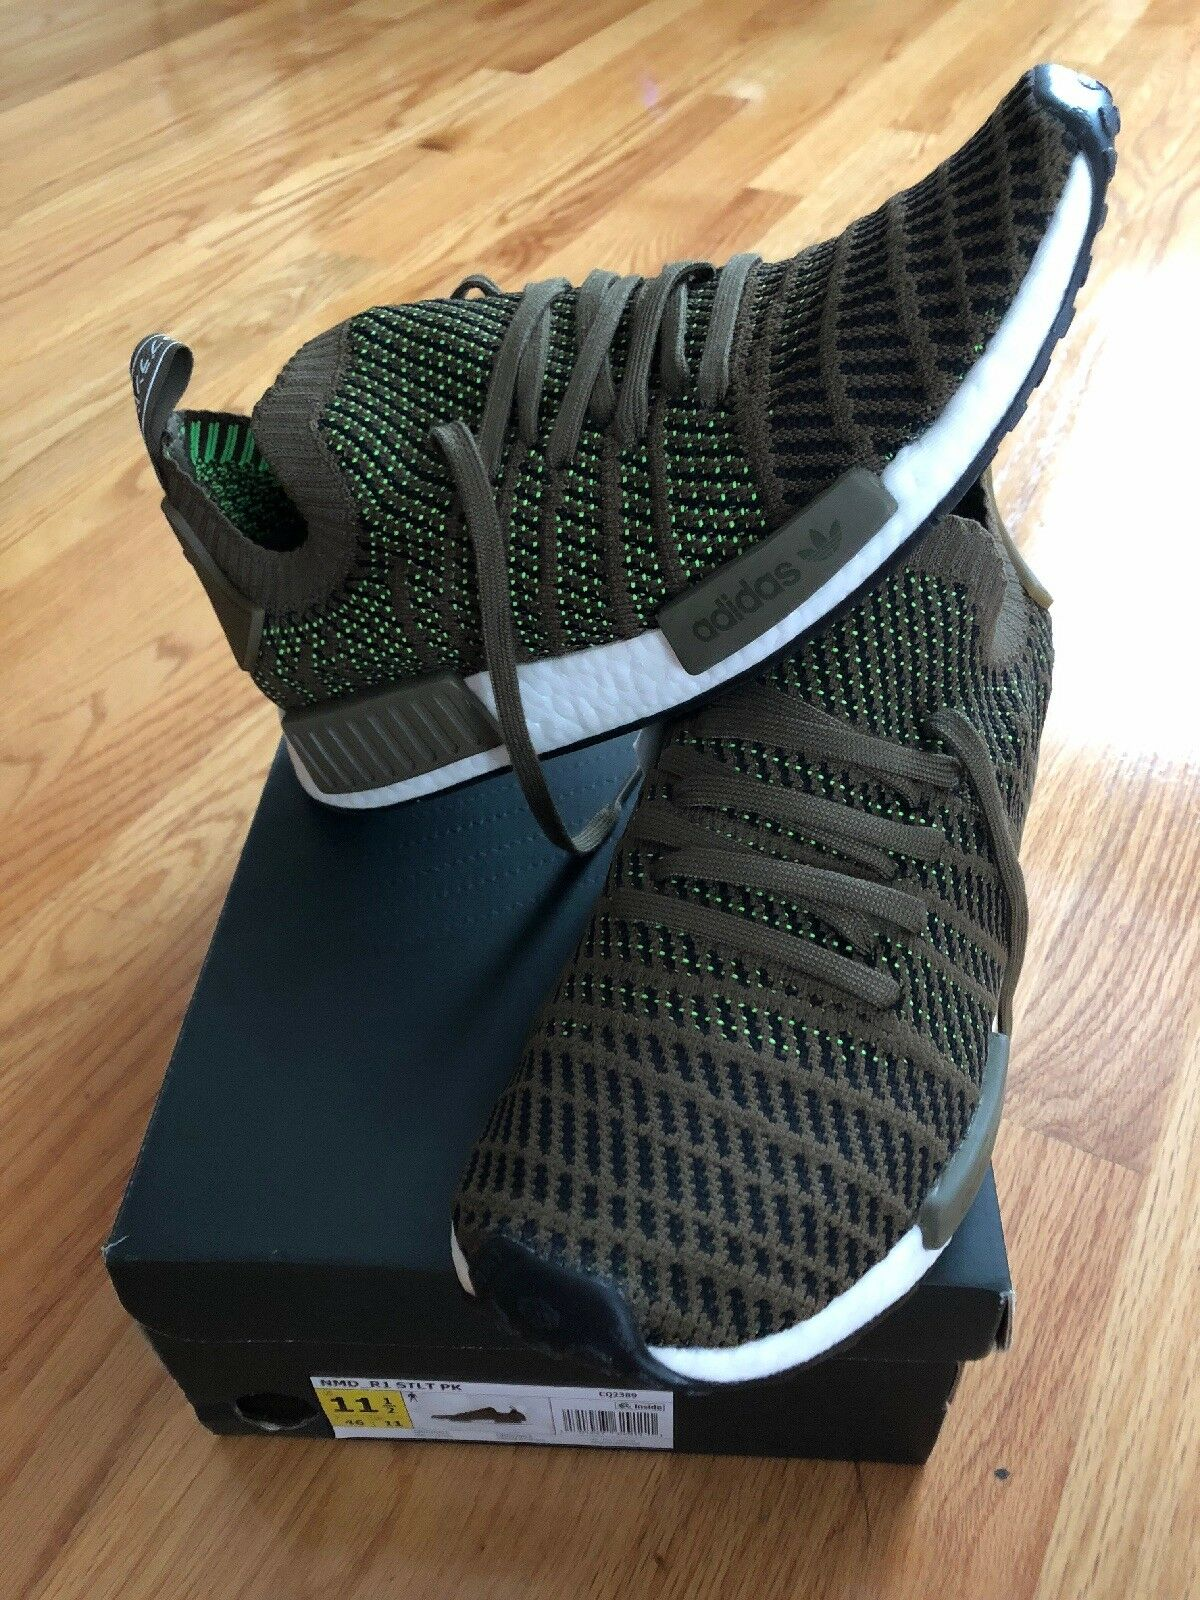 Adidas Adidas Adidas Boost NMO_R1 STLT pK New Dark Brown Green Size 11.5 Mens cf9f8a